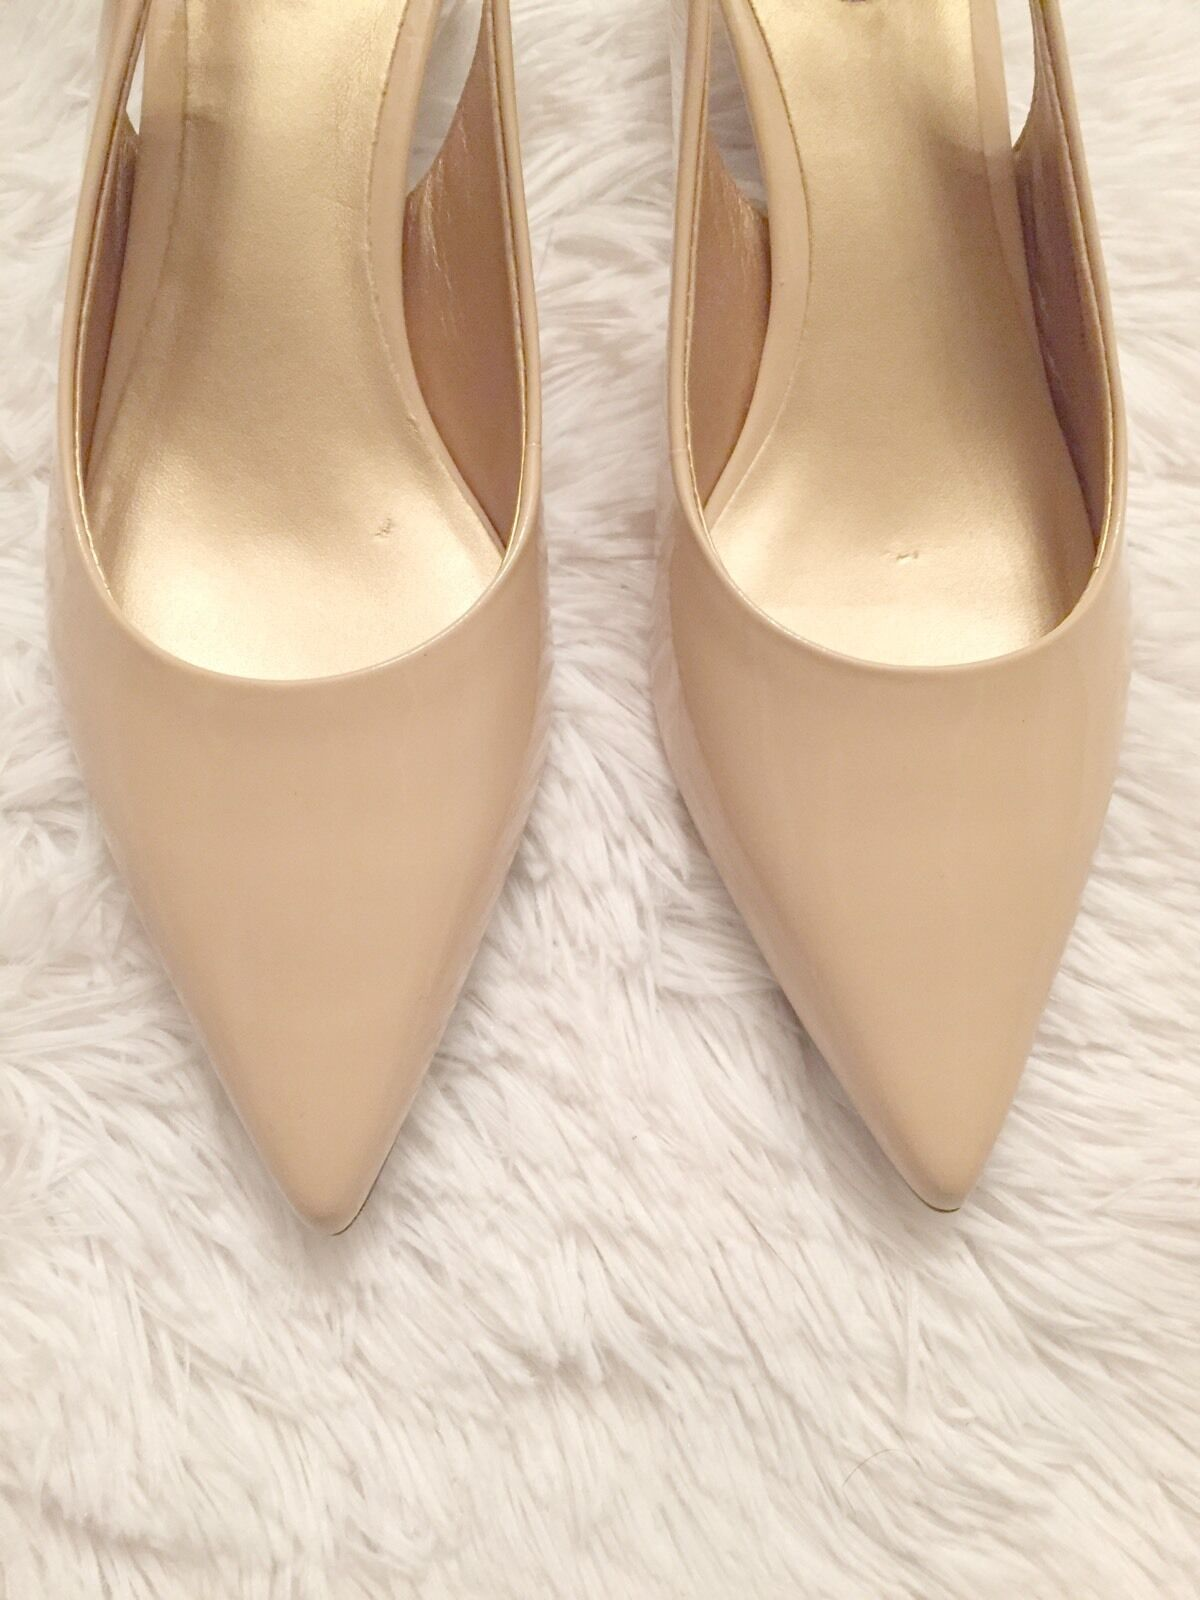 NEW Tredters Classic Prima Nude Patent Patent Patent Leather Kitten Heel Wide 6.5W Comfort 2f8f79